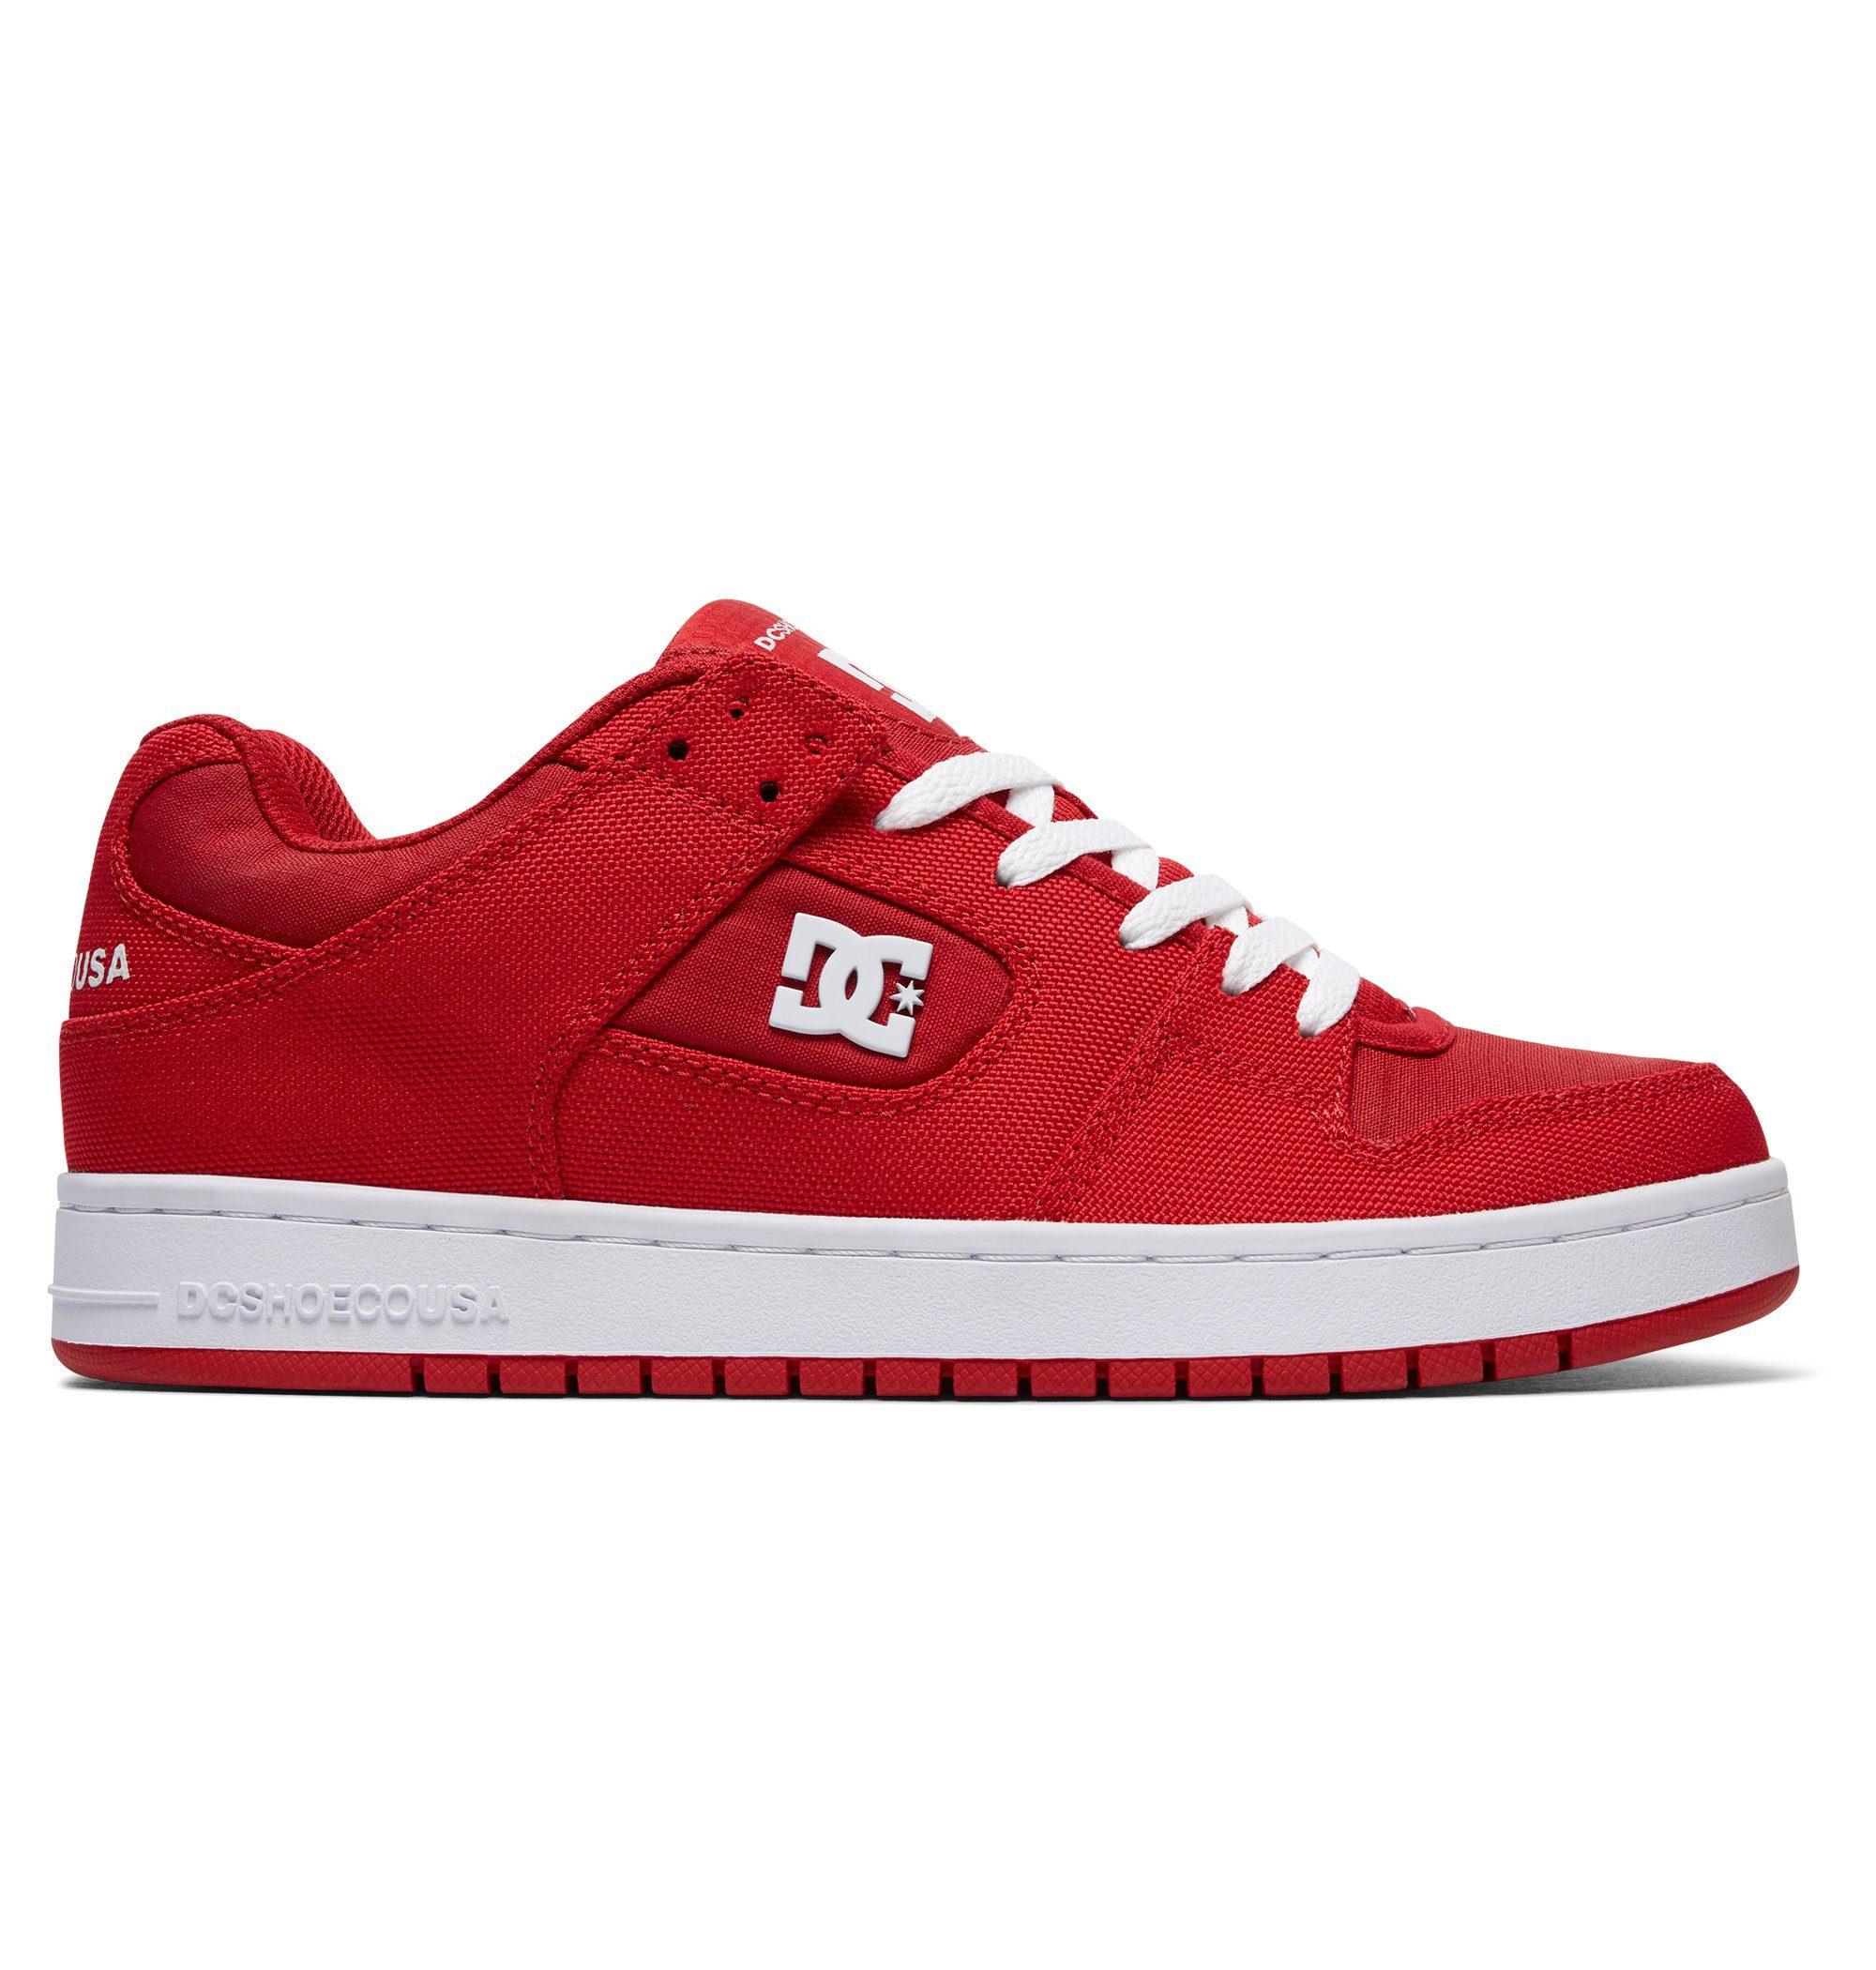 DC Shoes Schuhe Manteca TX SE online kaufen  Red#ft5_slash#white